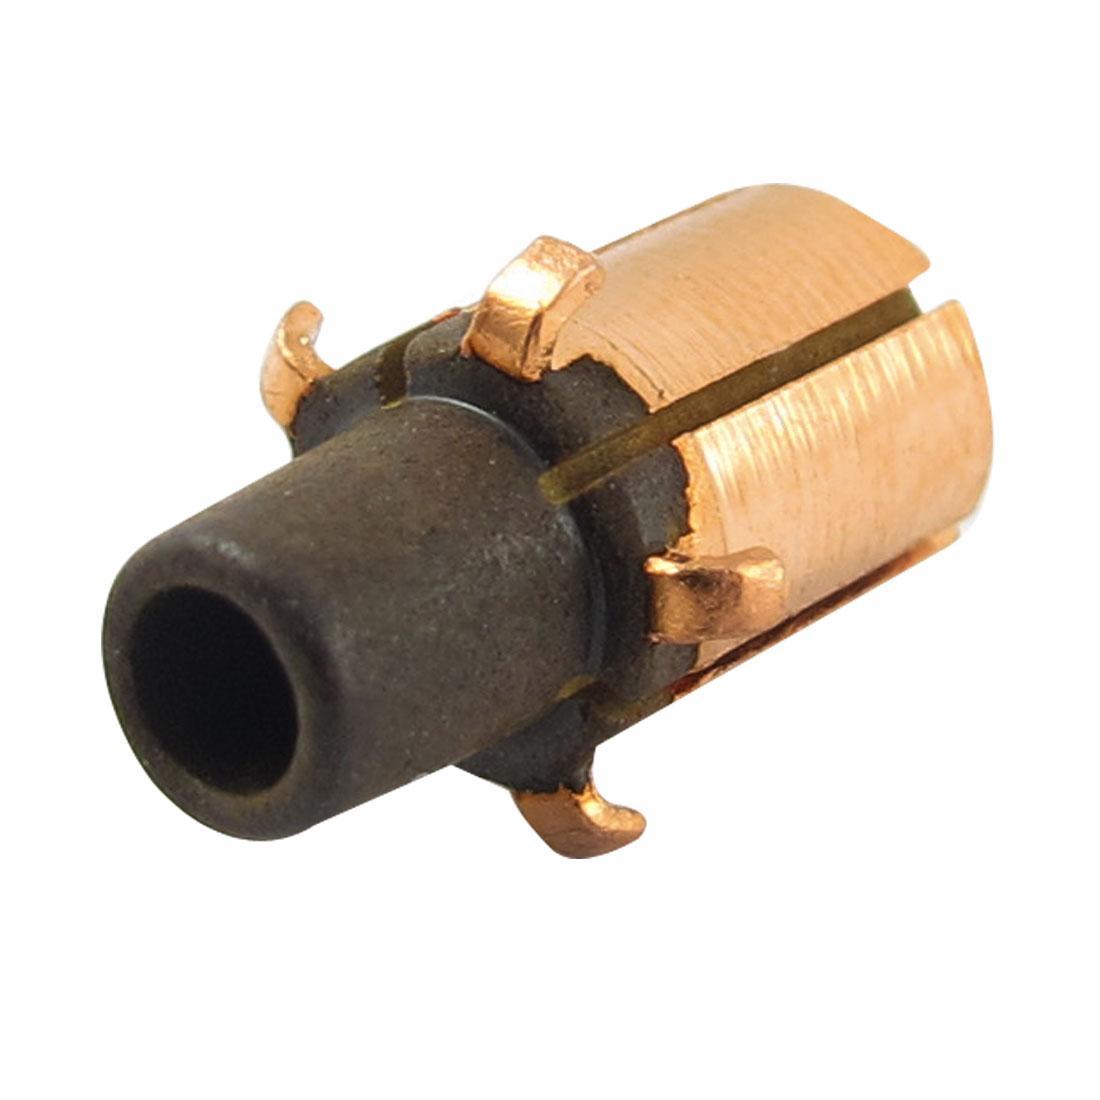 2.3mm x 5.6mm x 12mm 5P Copper Bars Alternator Electric Motor Commutator